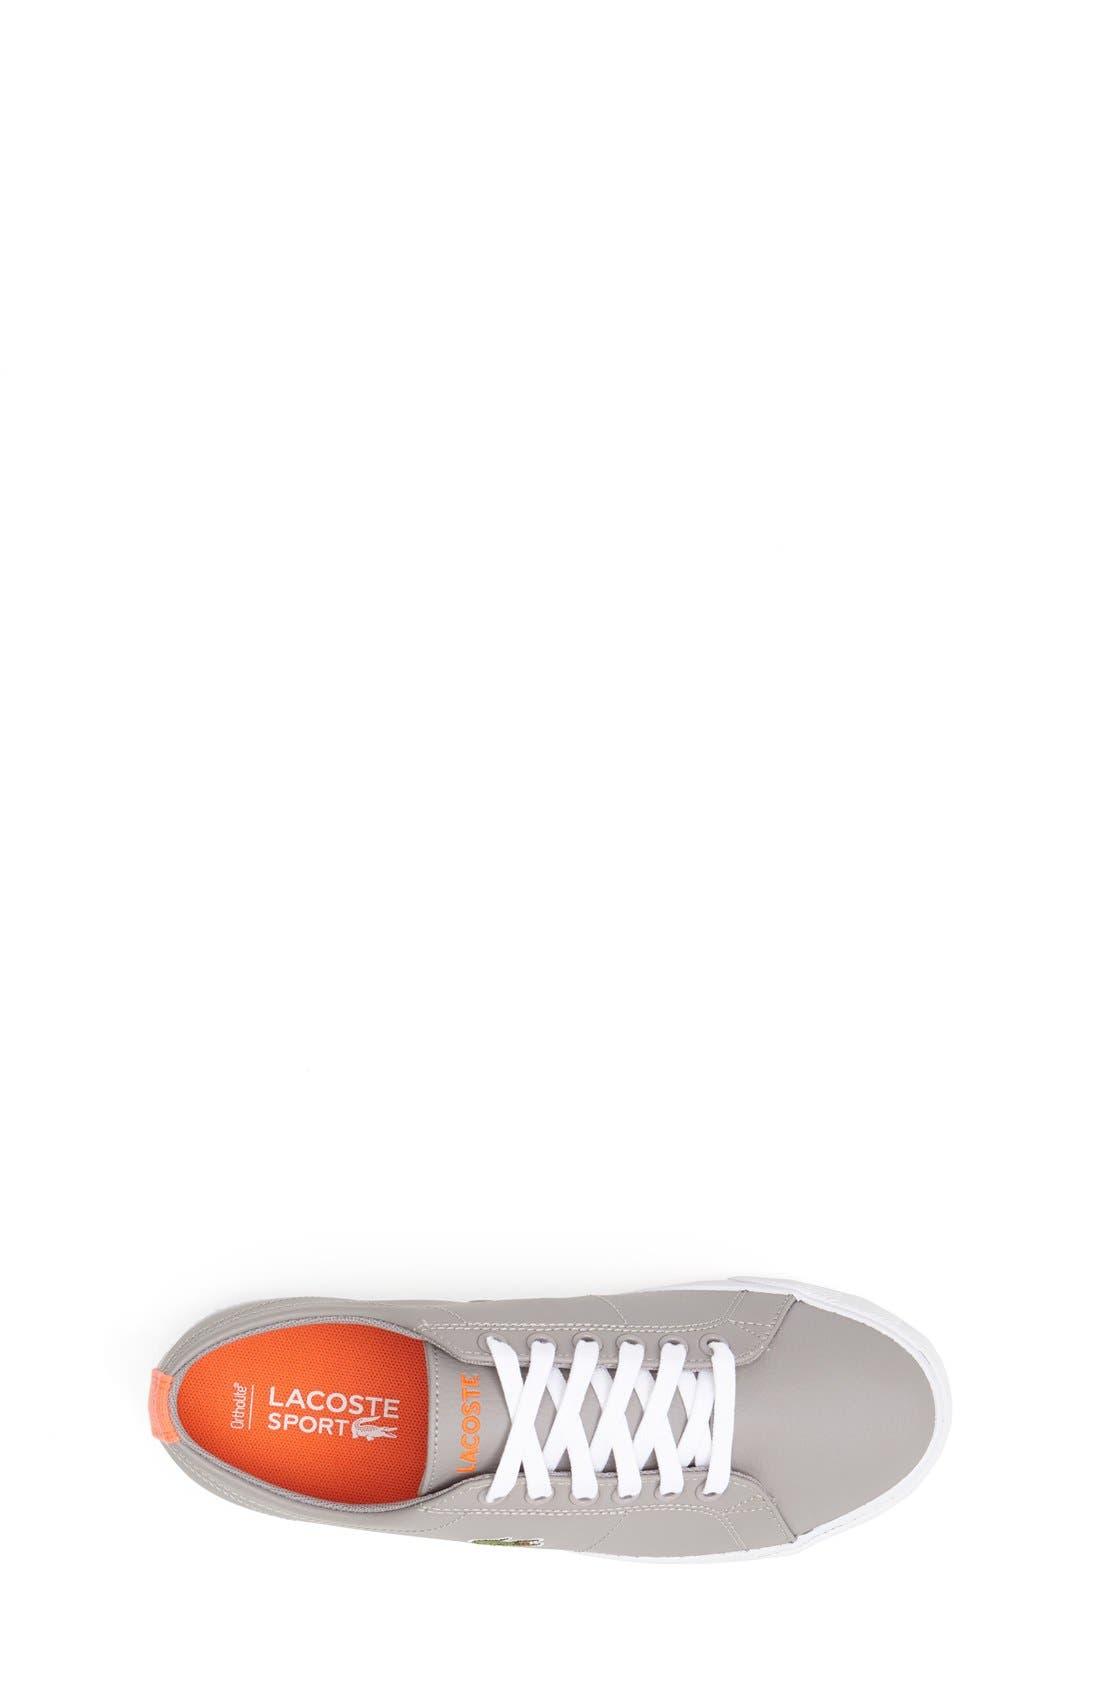 Alternate Image 3  - Lacoste 'Marcel' Sneaker (Toddler, Little Kid & Big Kid)